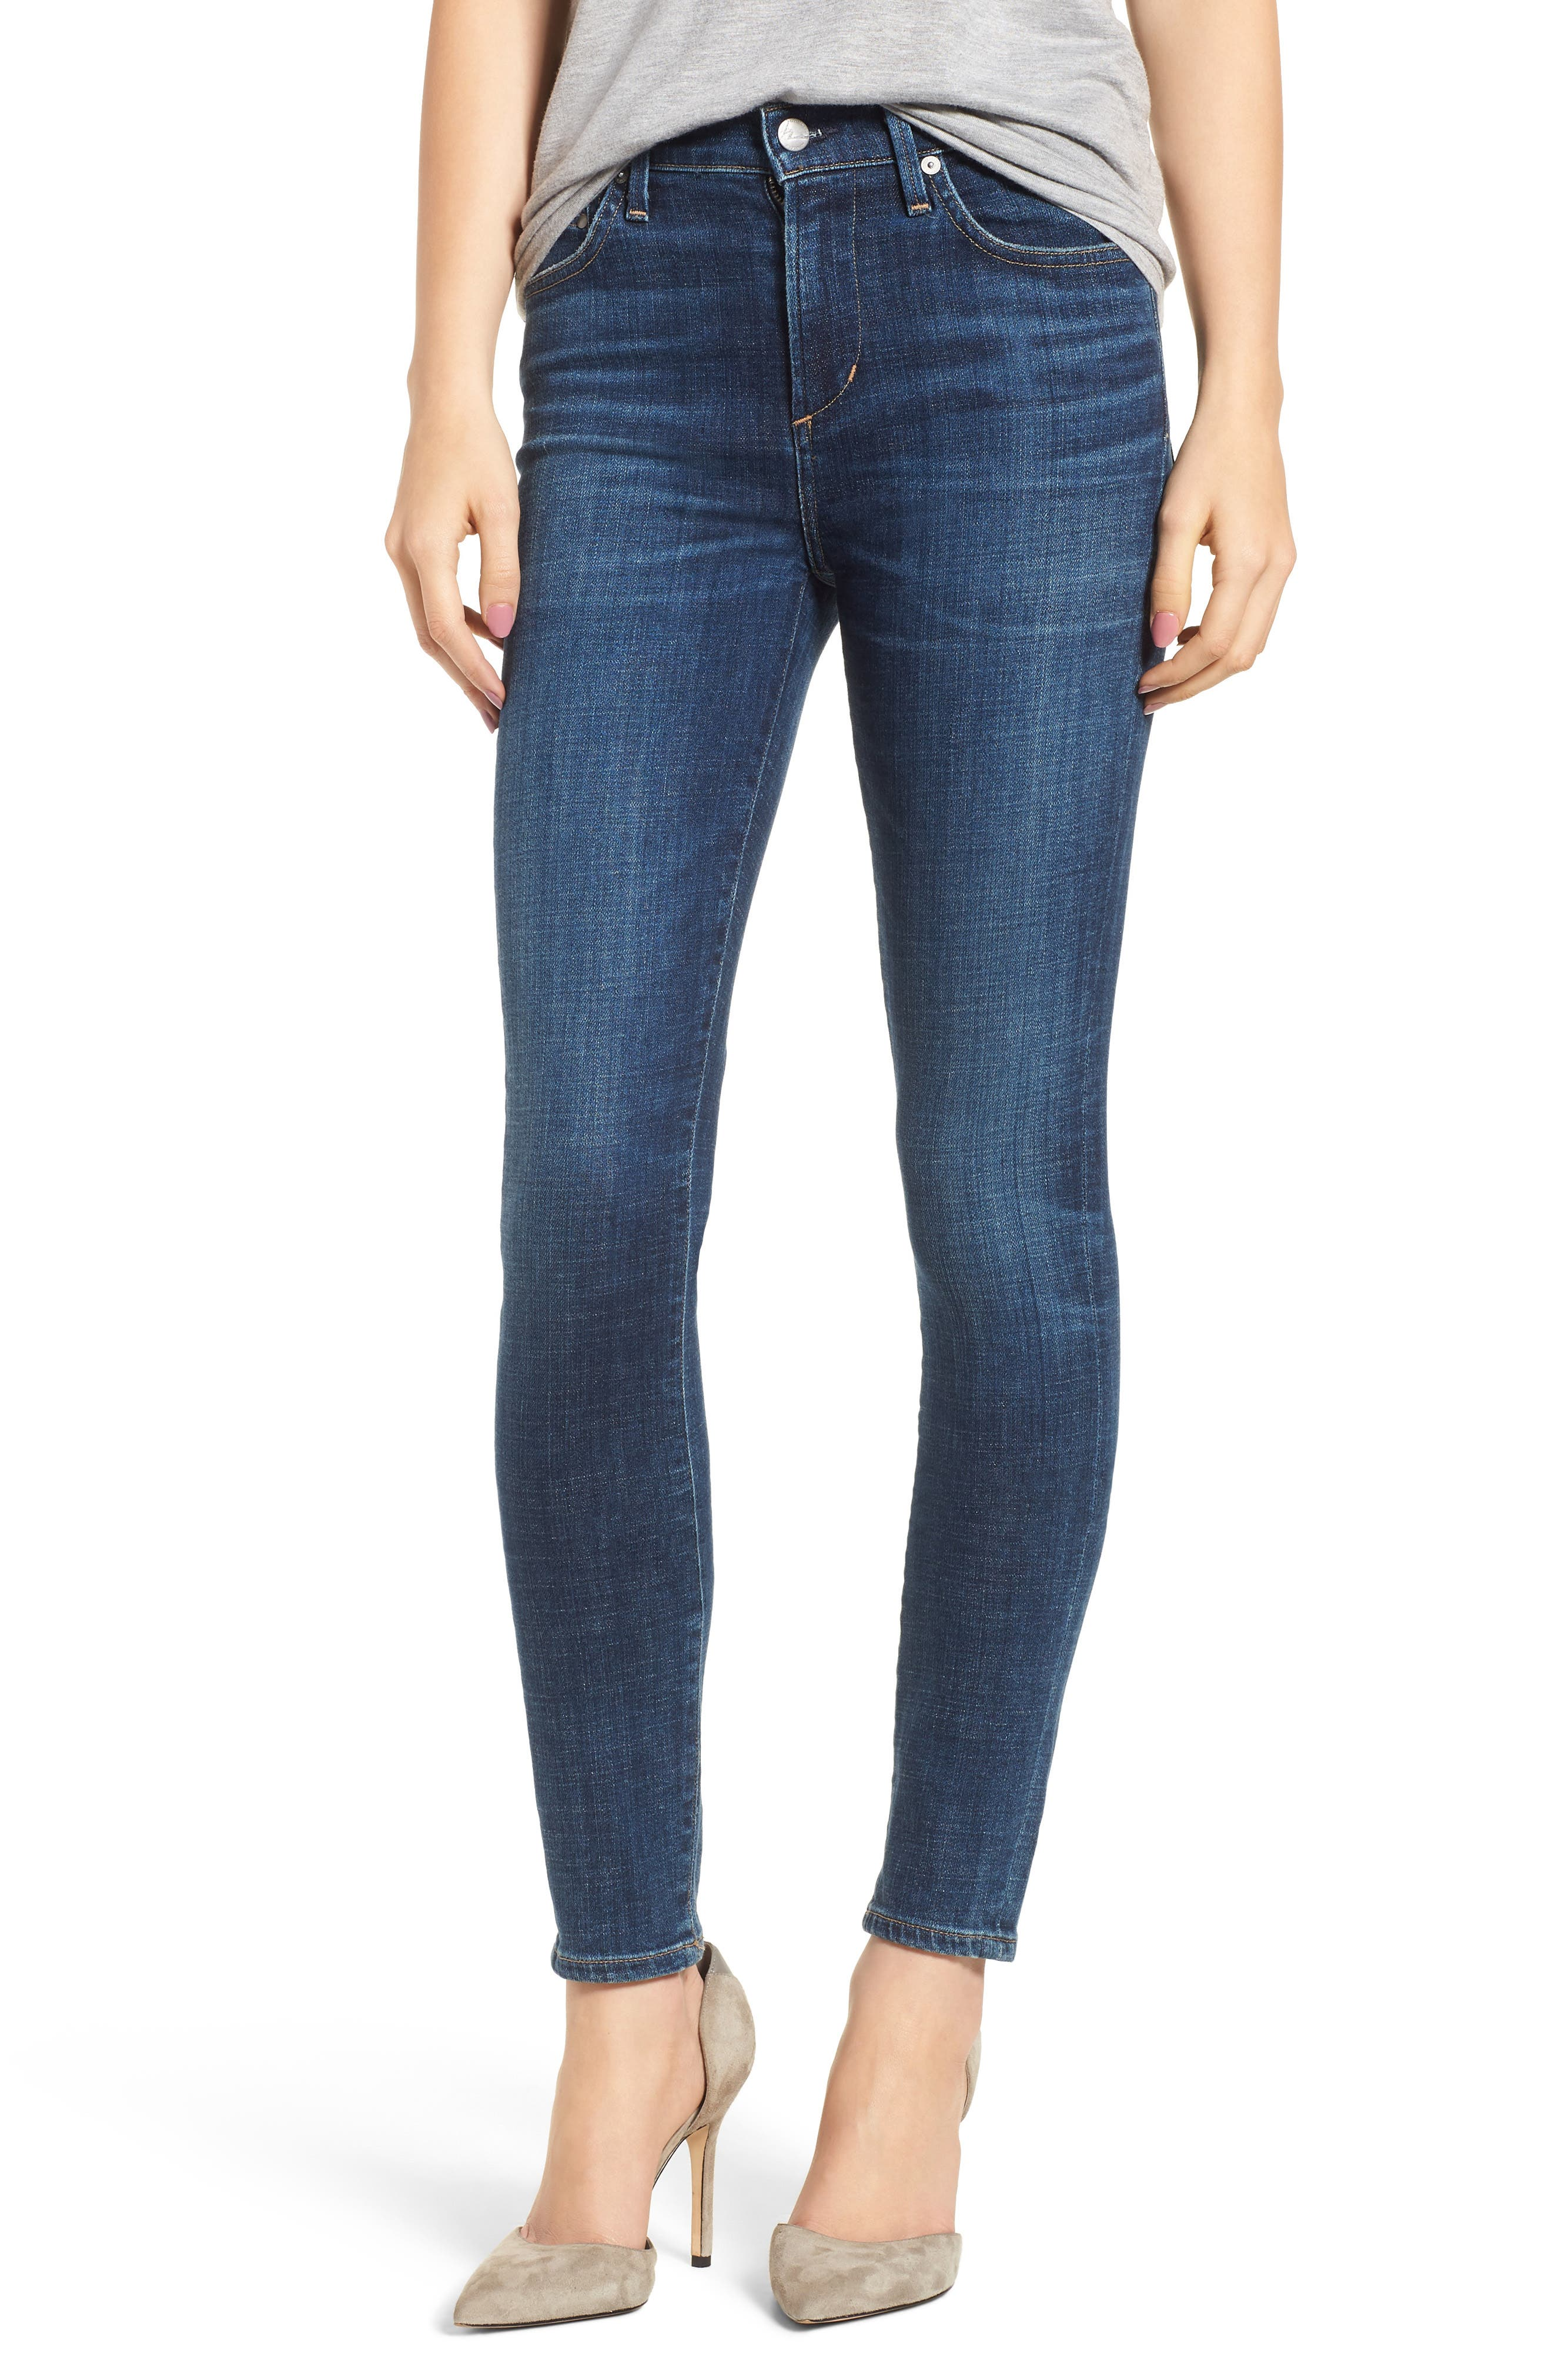 Rocket High Waist Skinny Jeans,                         Main,                         color, 428